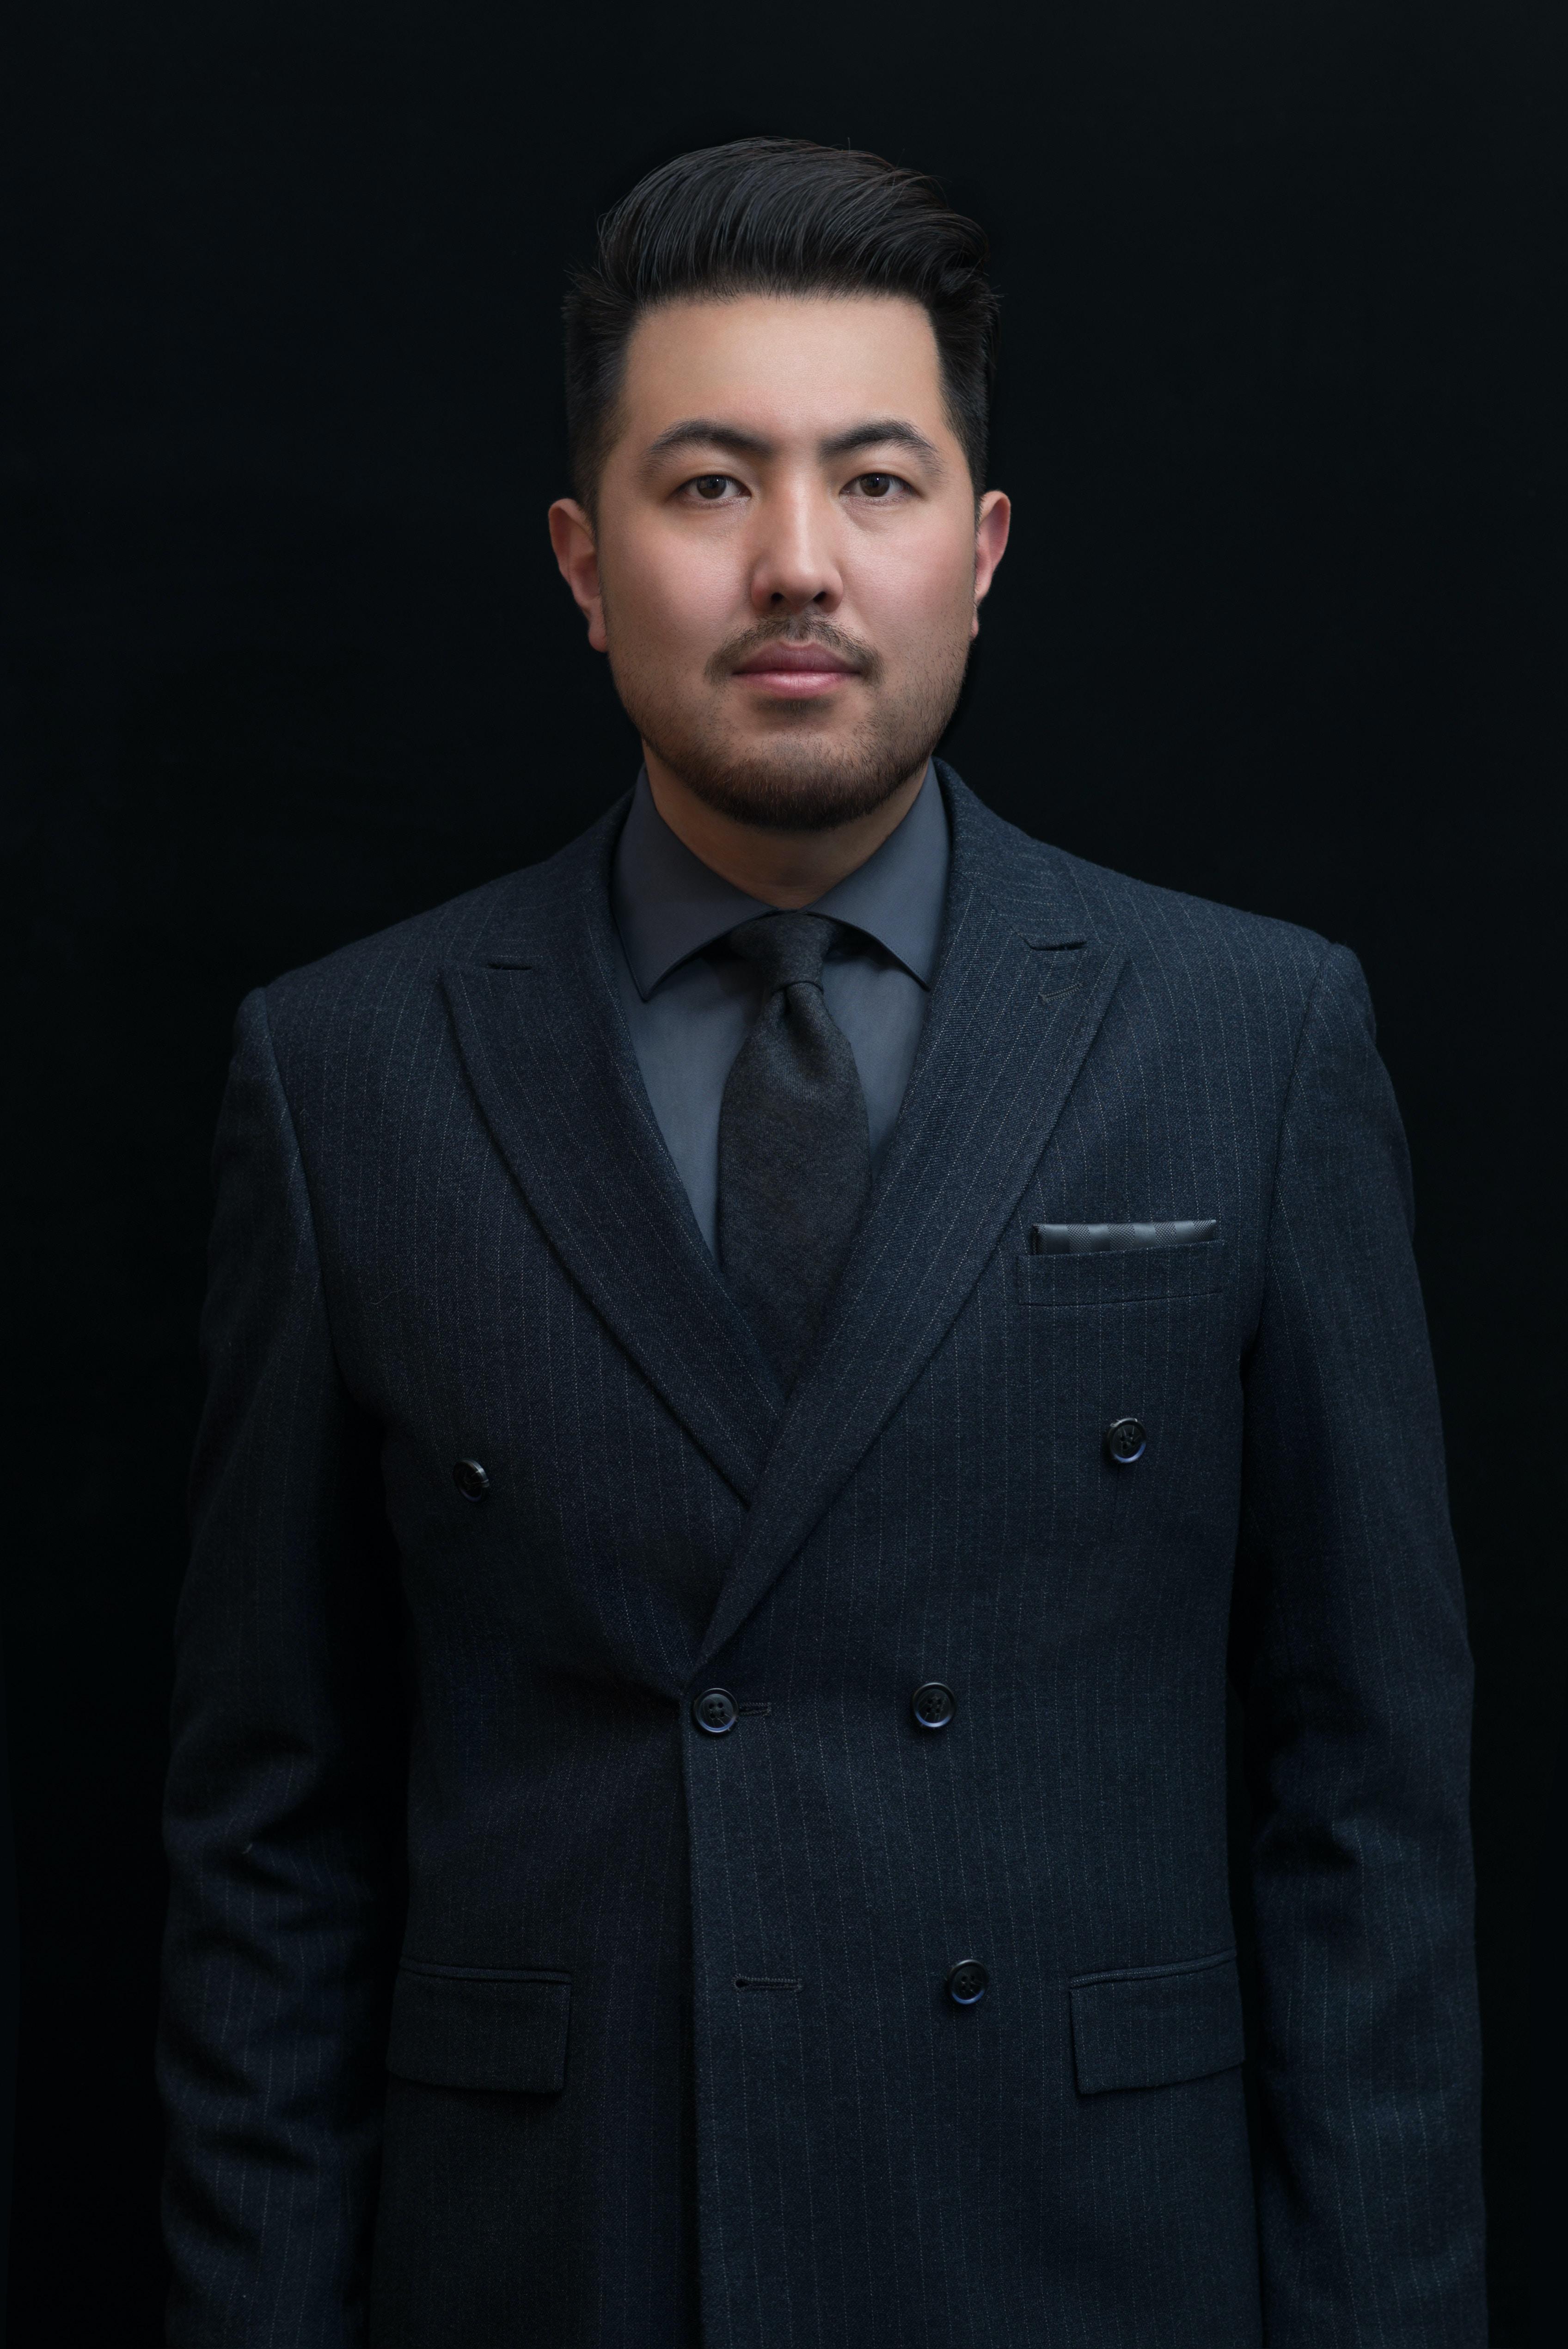 man in black formal suit jacket